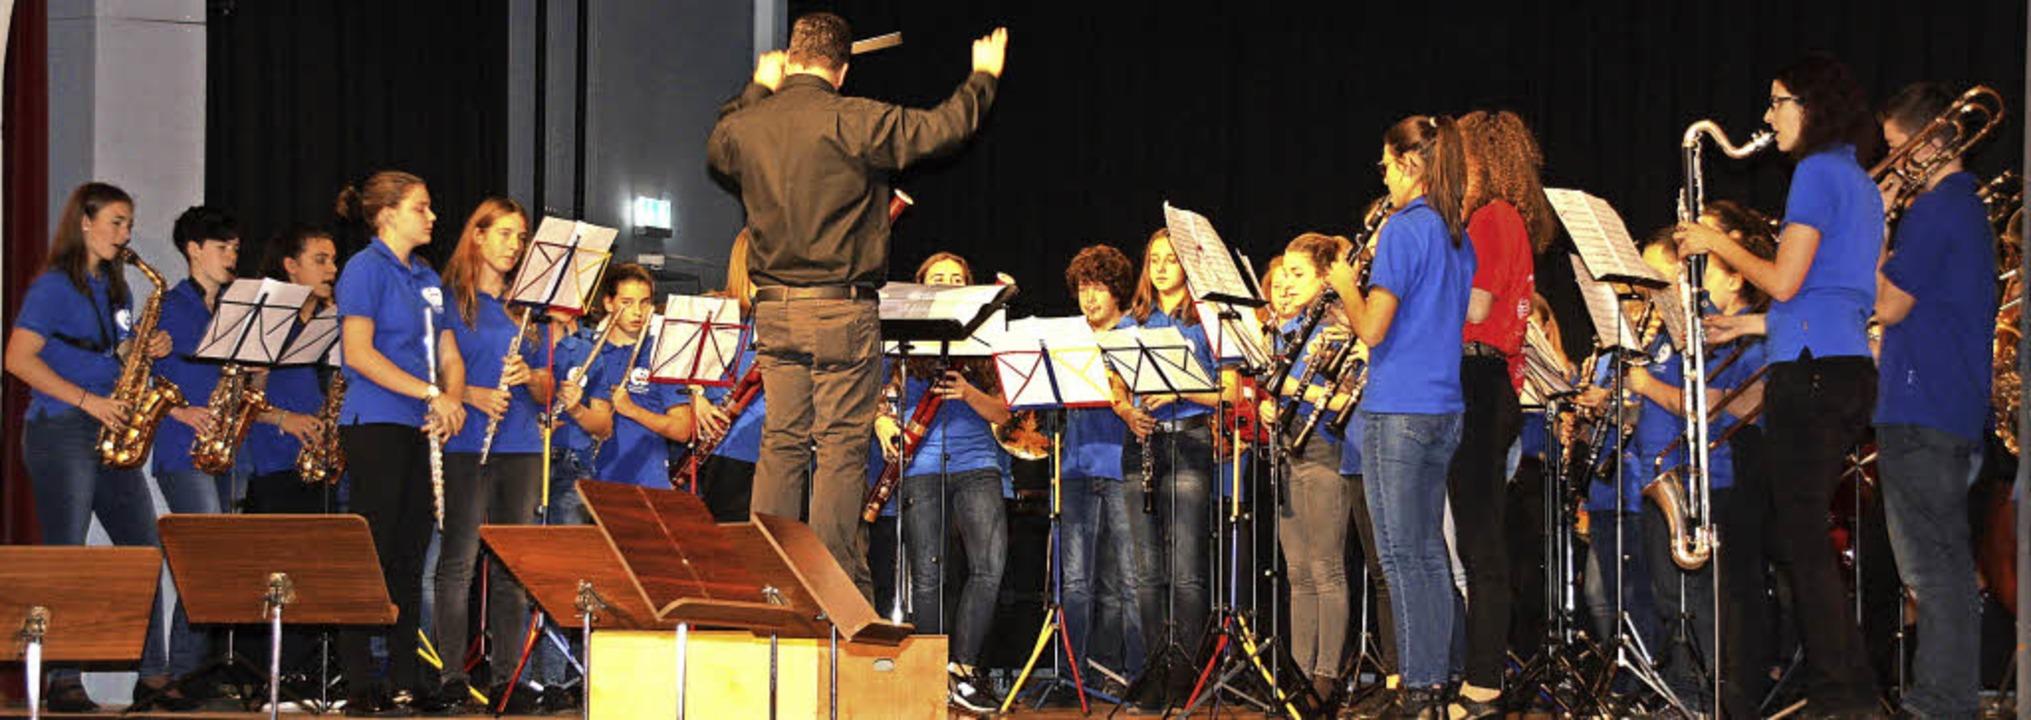 Virtuose Blasmusik bot das Bläserfesti...Mitwirkung der Endinger Jugendkapelle.  | Foto: Christiane Franz